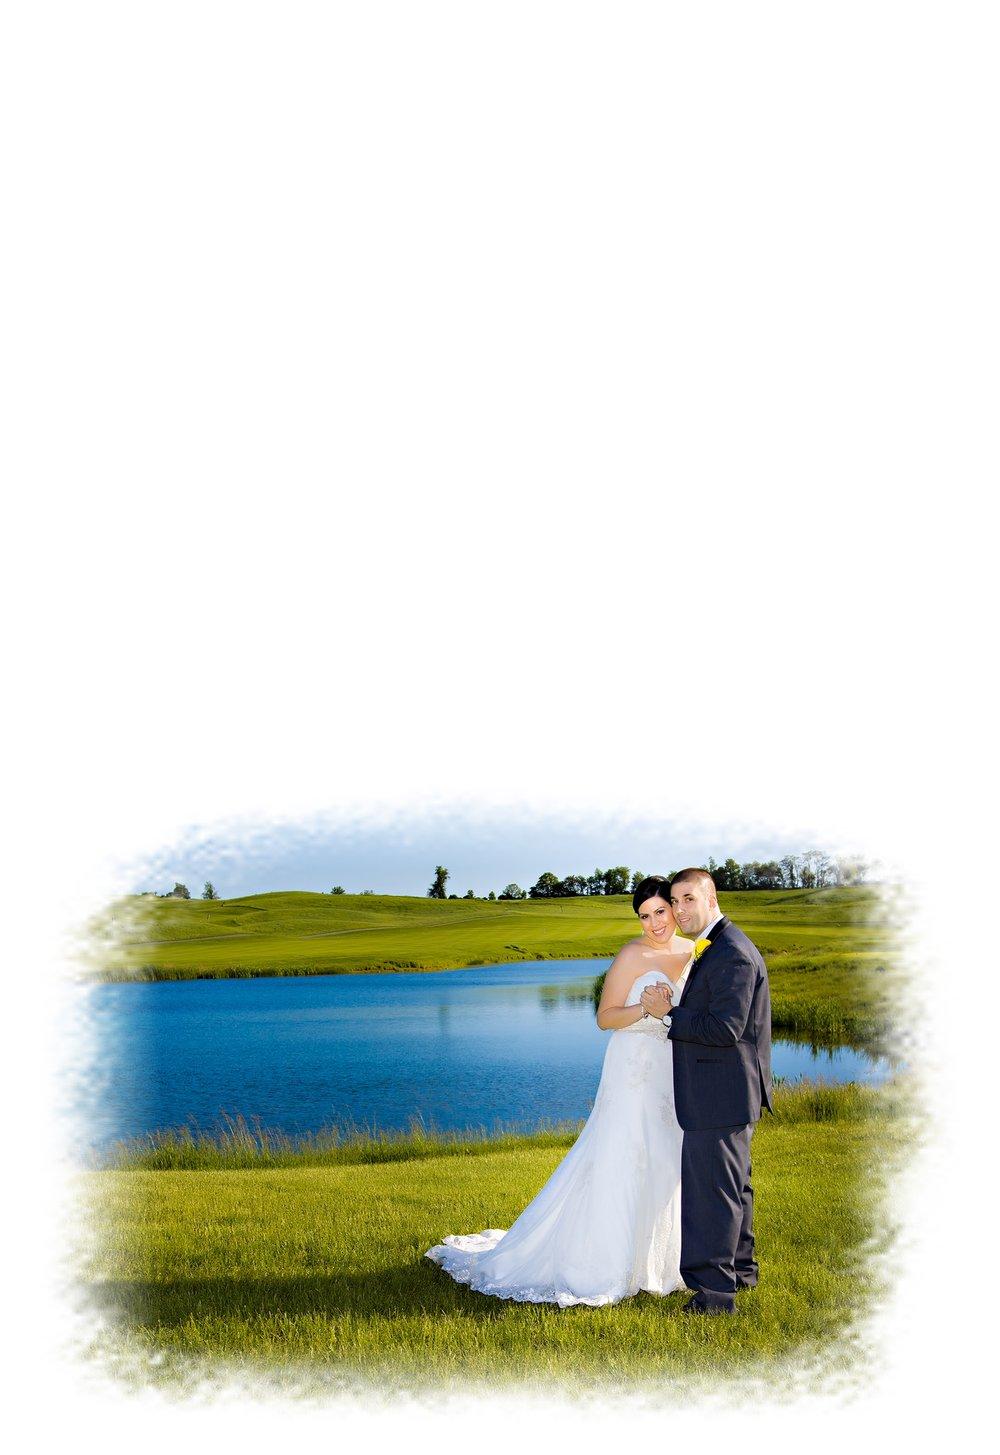 bergen_county_new_jersey_wedding_thank_you_cards_0001.jpg